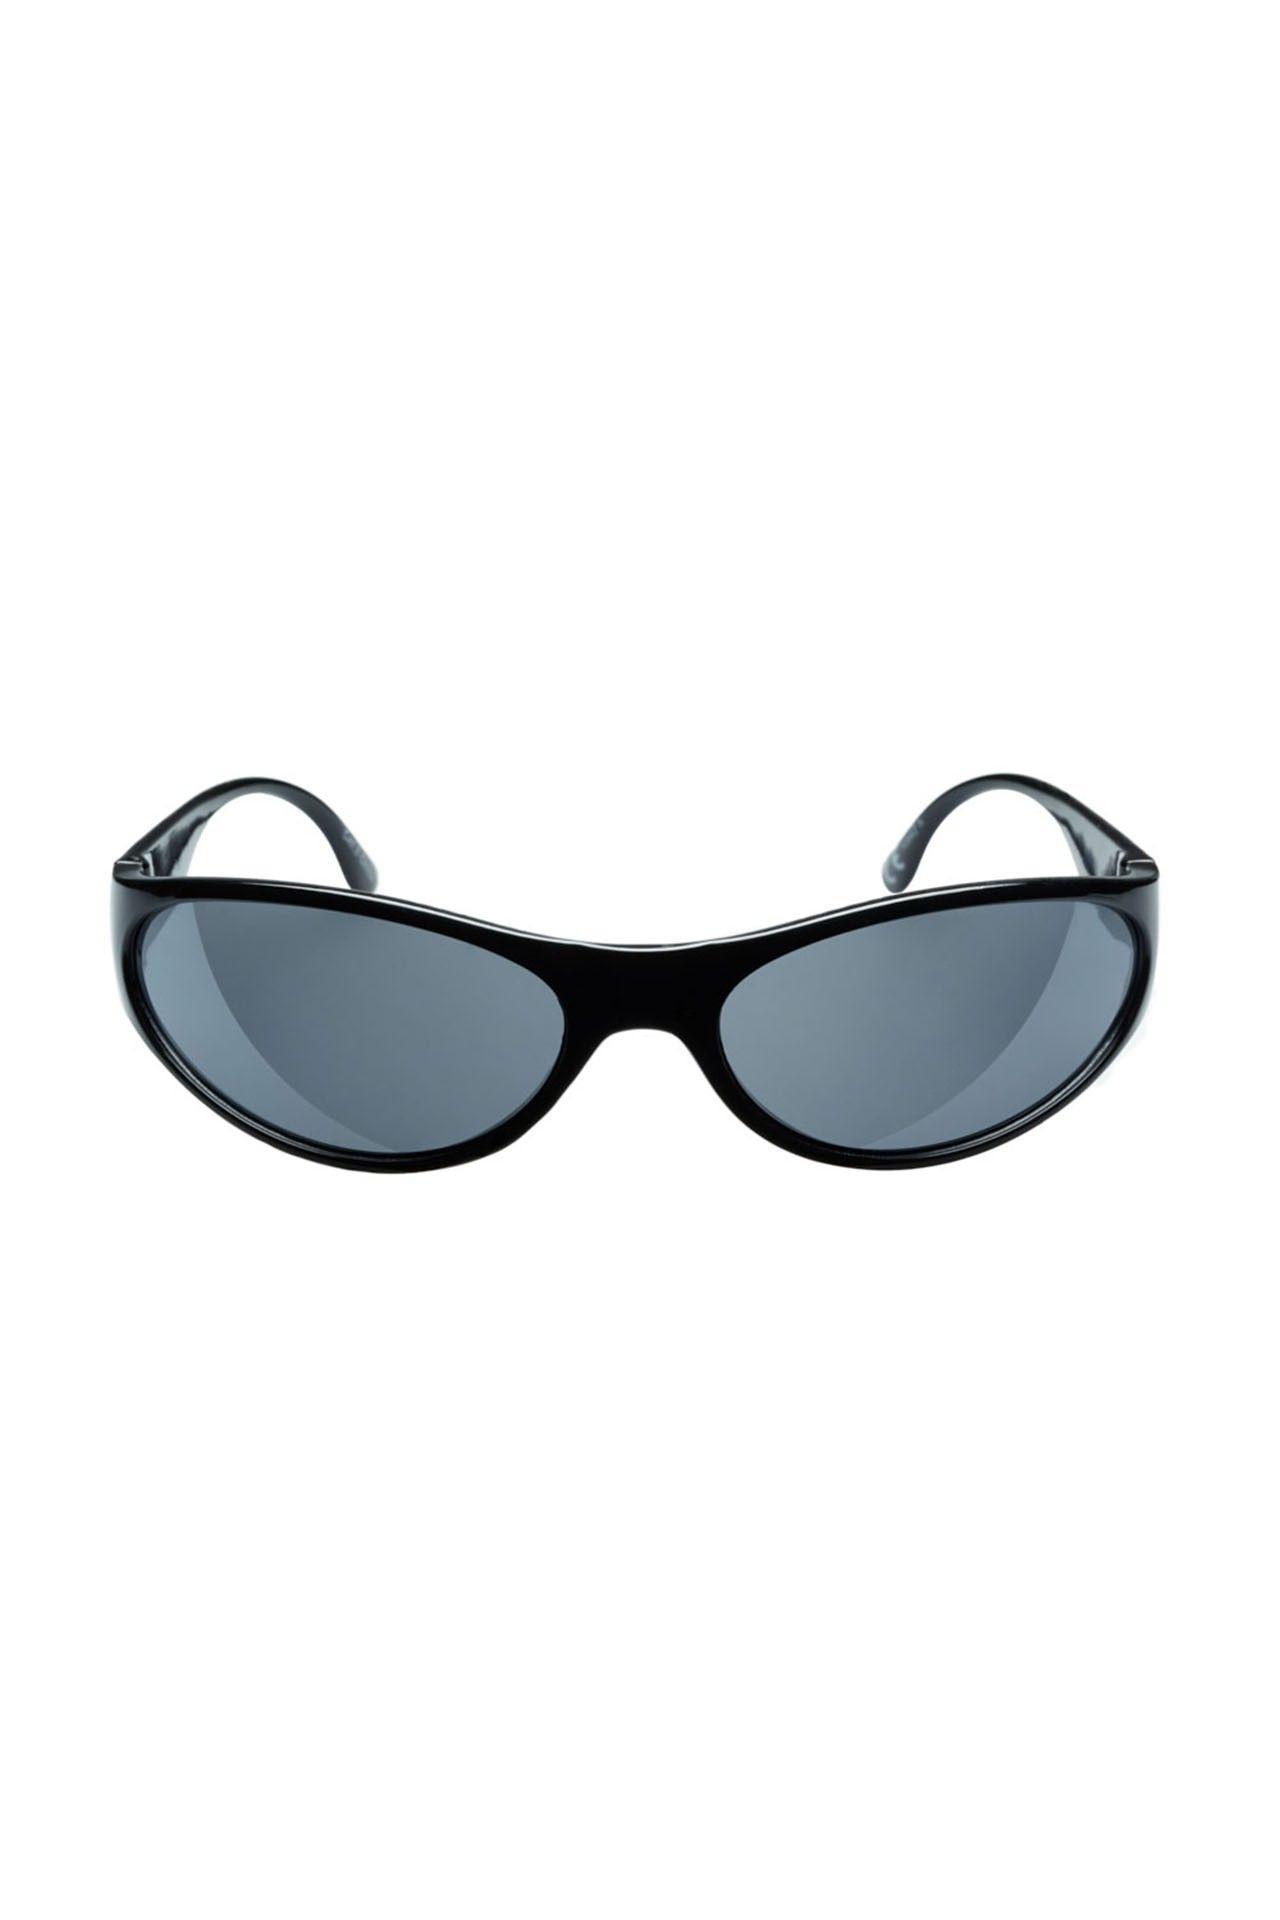 Afbeelding van Icon Eyewear Zonnebril 10842 Black A